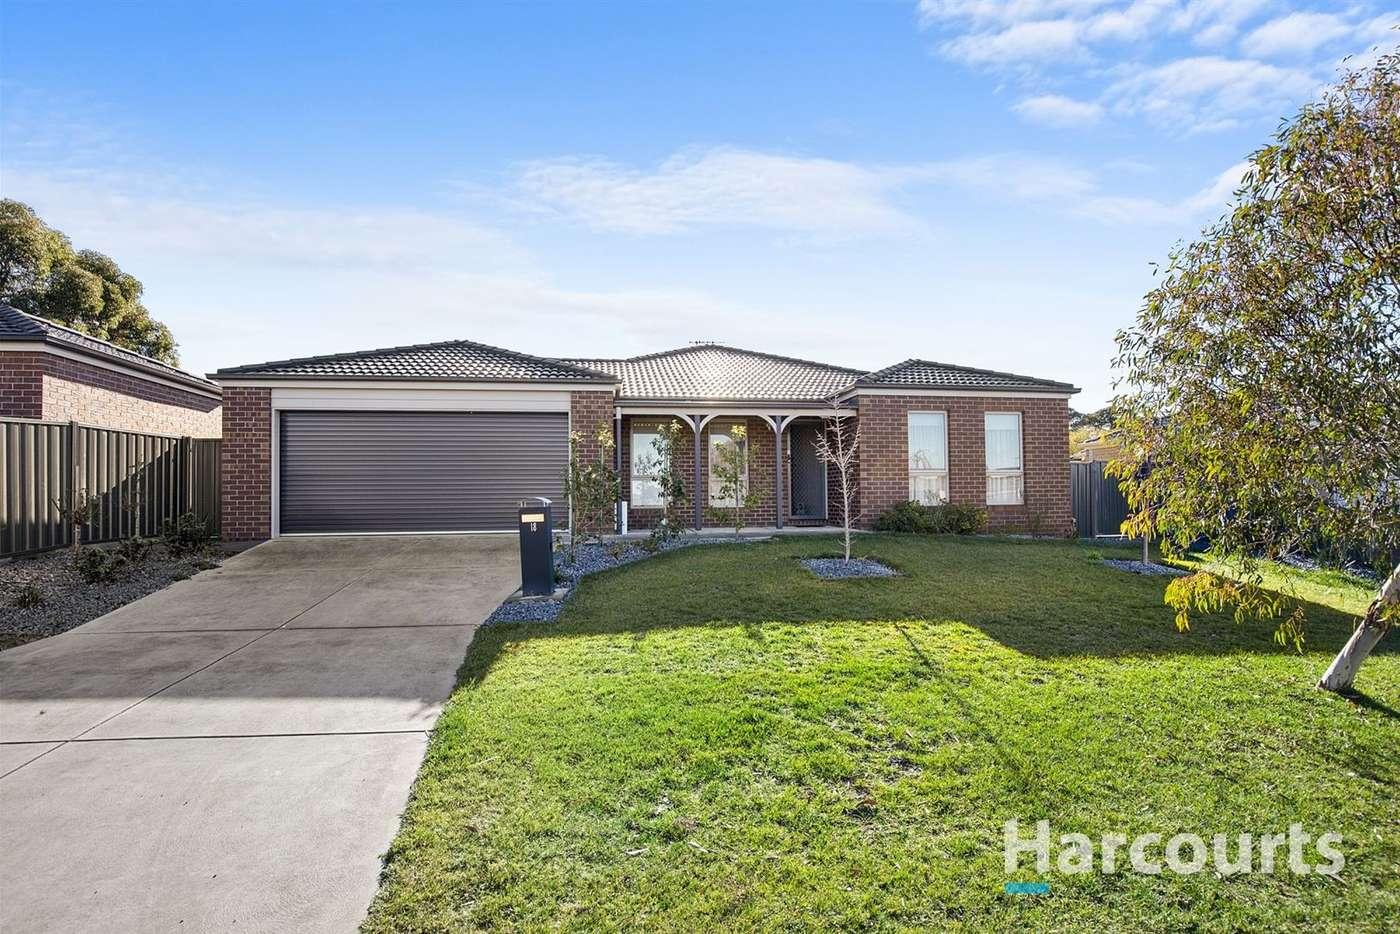 Main view of Homely house listing, 18 Moorabool Drive, Ballan VIC 3342